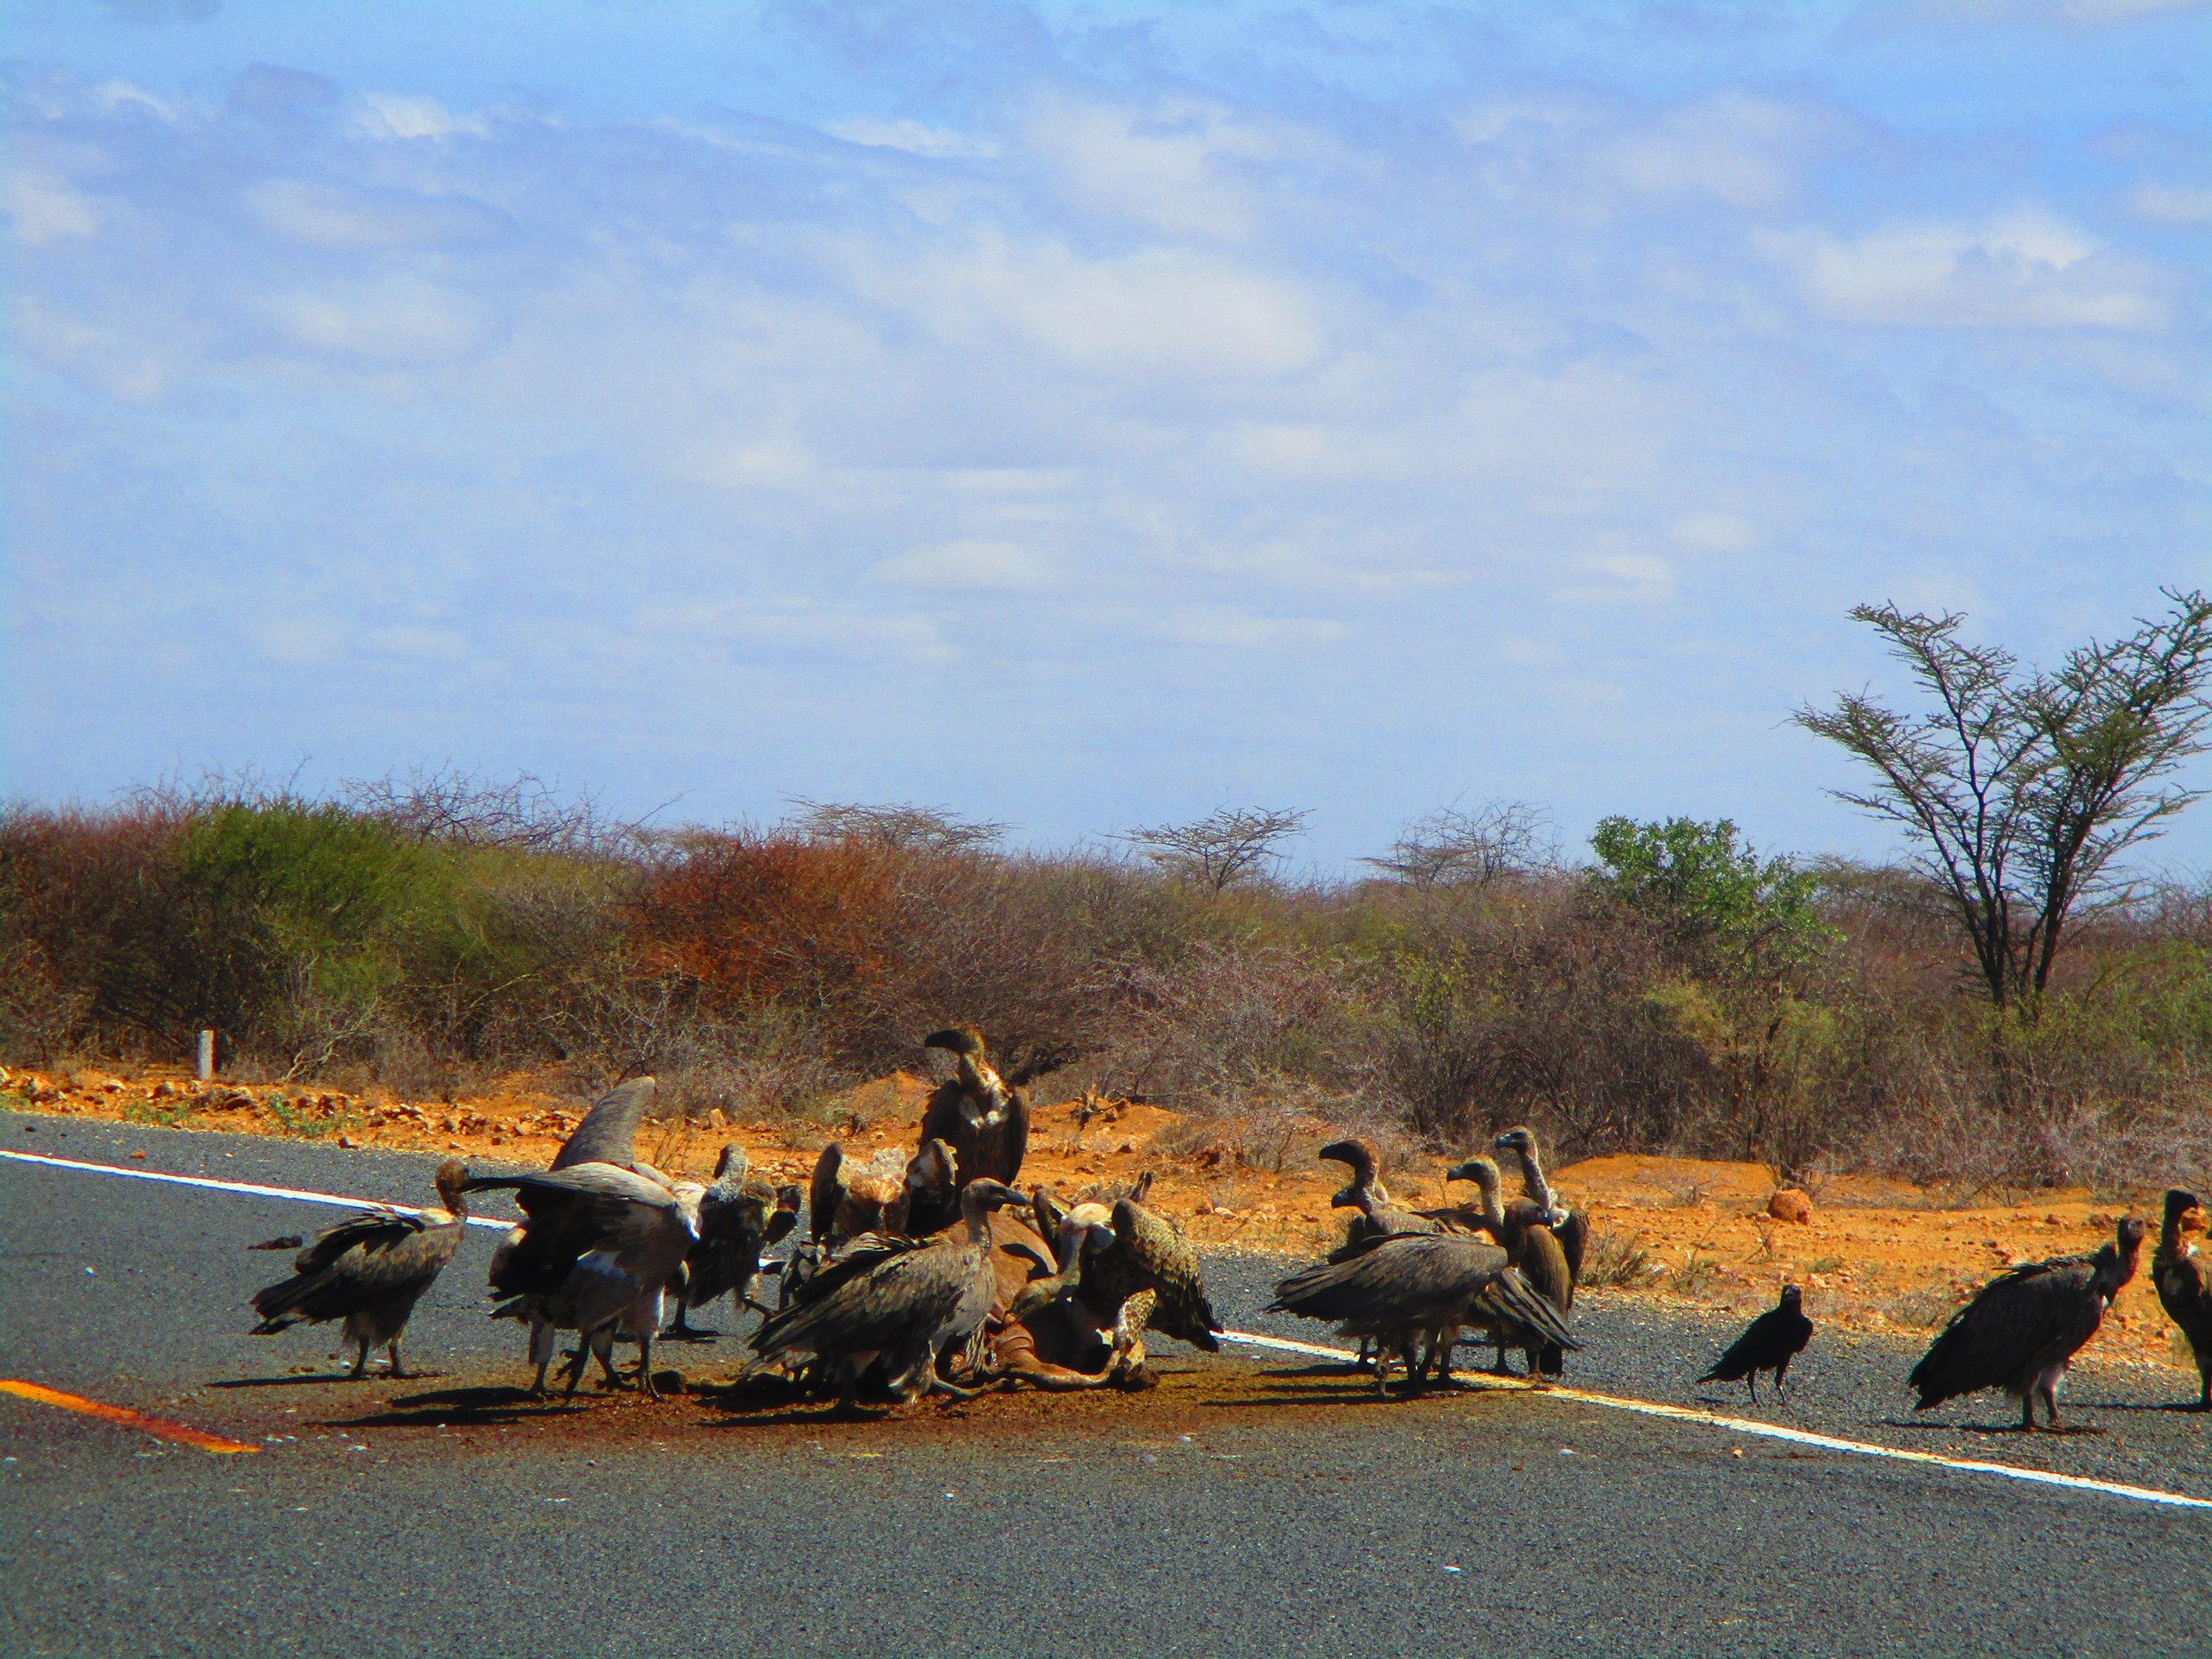 Vultures feeding on donkey road-kill